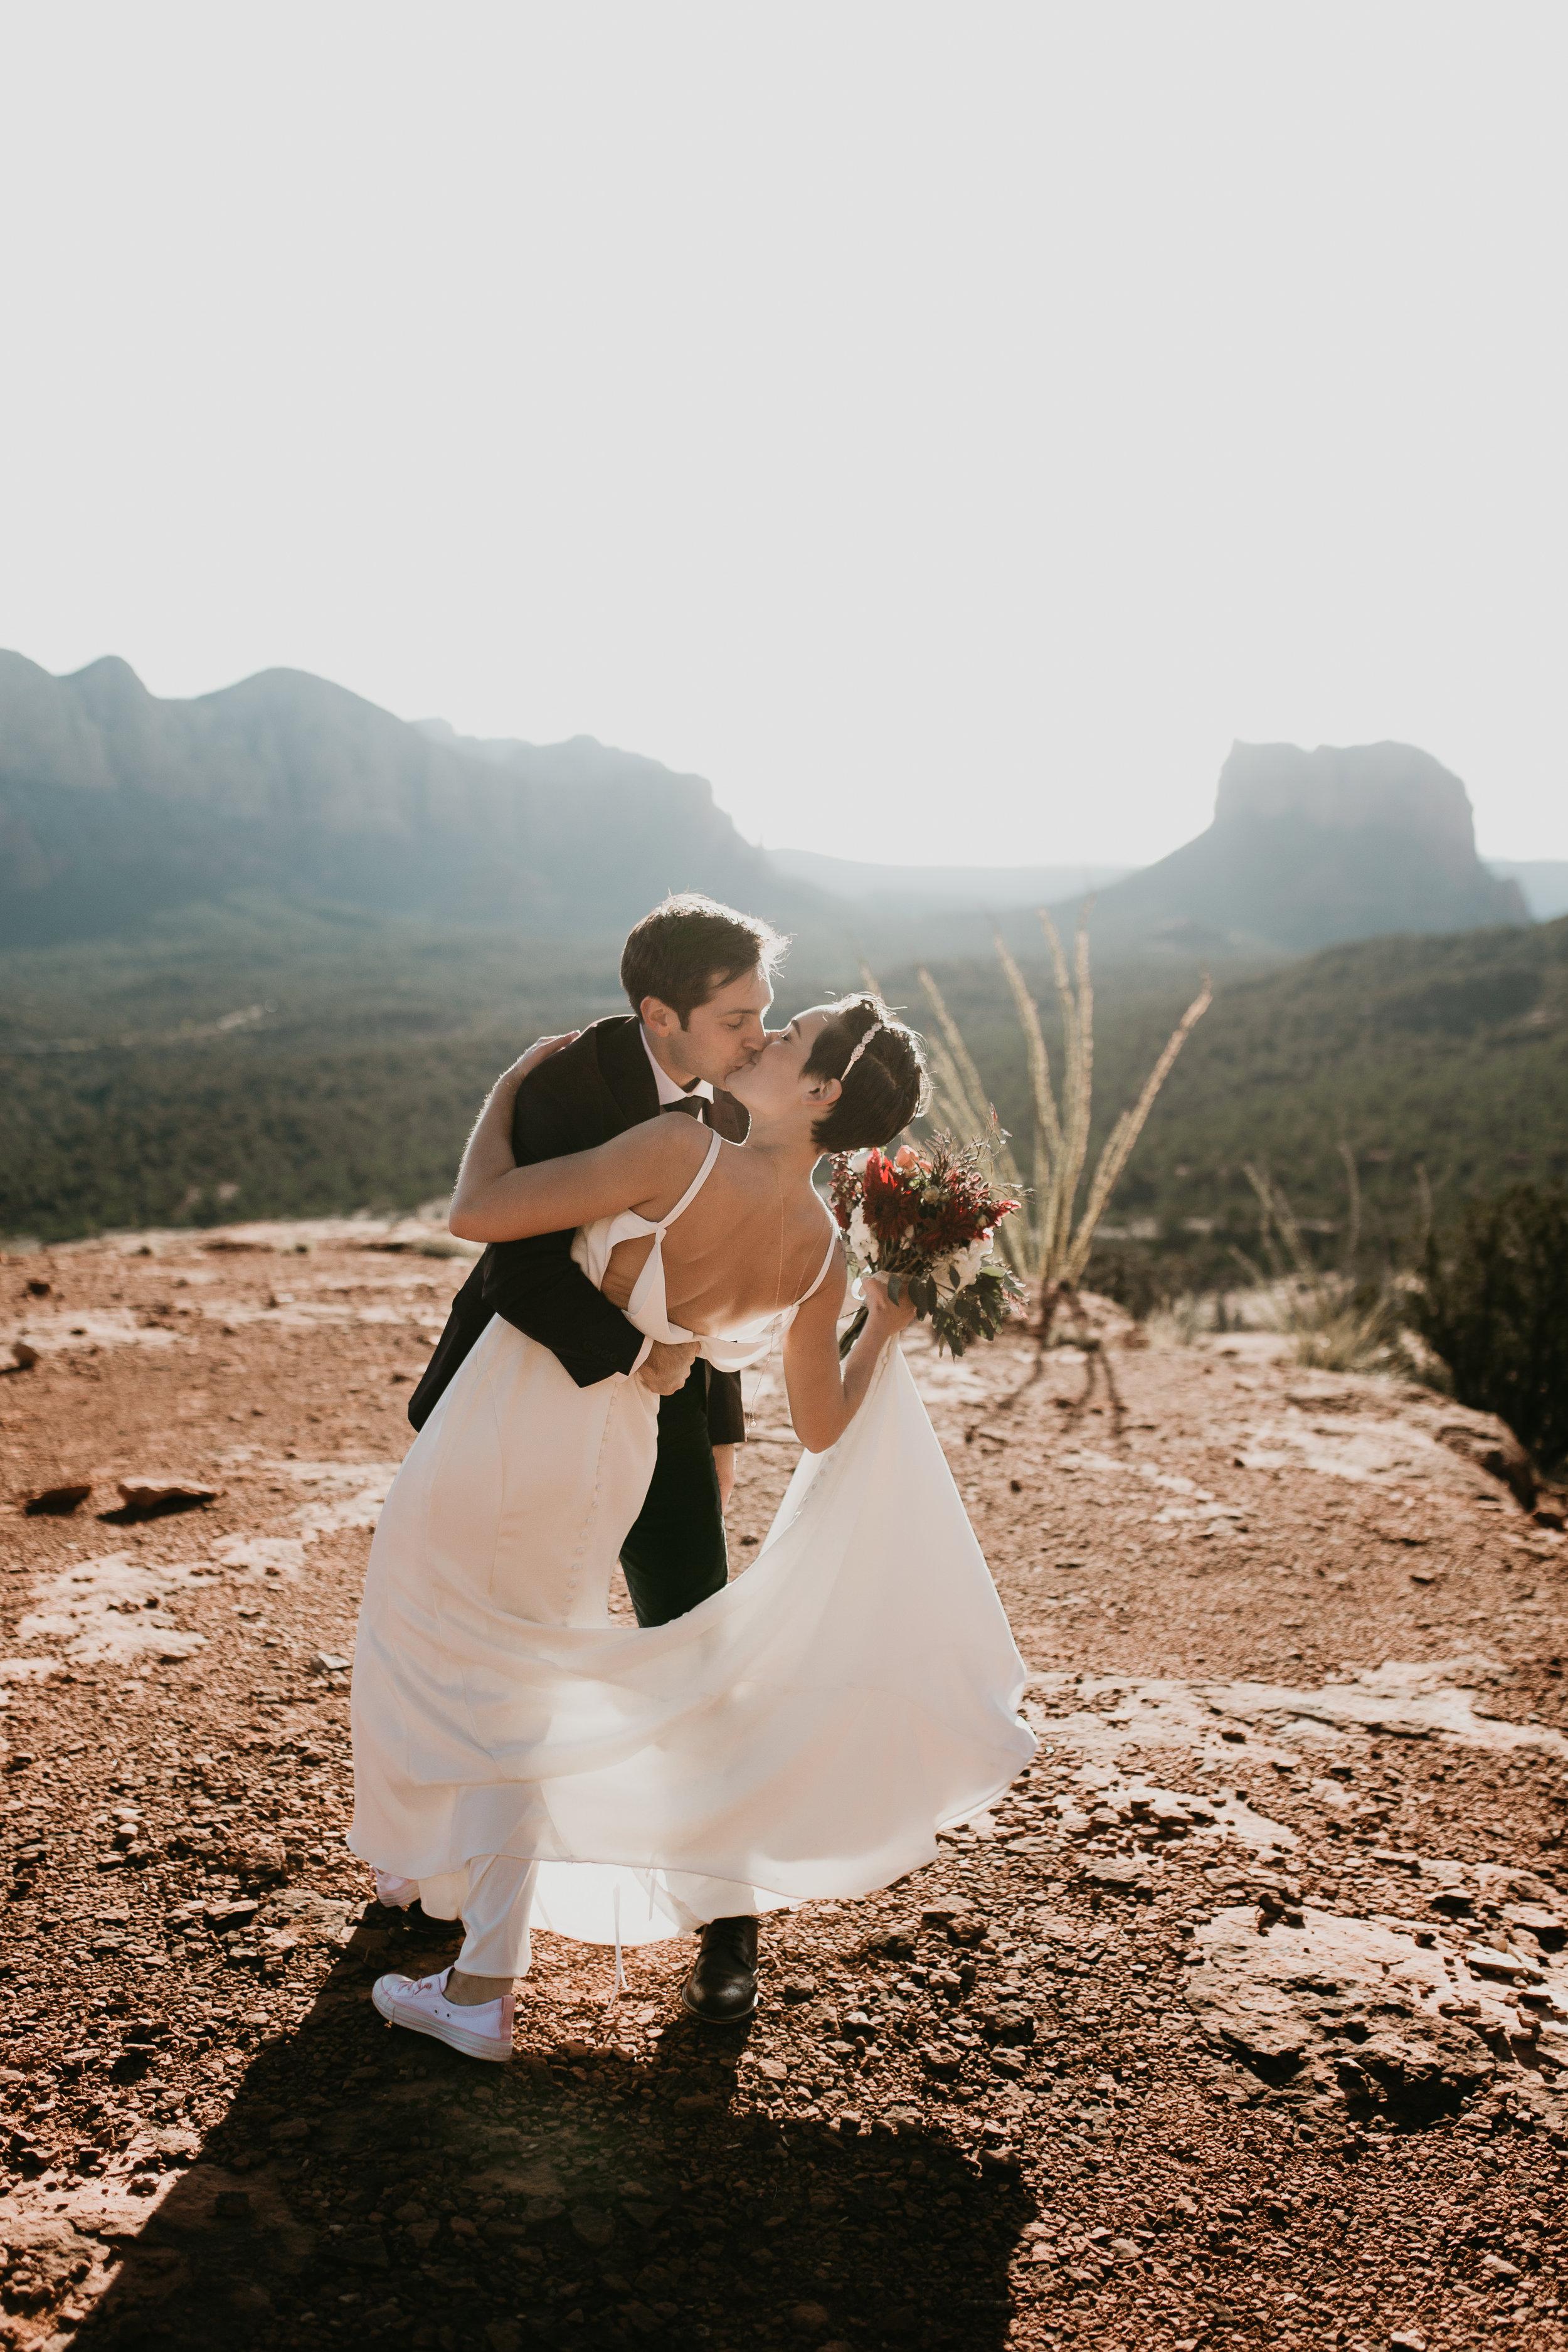 nicole-daacke-photography-sedona-arizona-destination-elopement-wedding-photographer-catherdral-rock-hiking-elopement-sedona-river-elopement-photos-desert-rock-wedding-photographer-laid-back-spontaneous-elopement-68.jpg